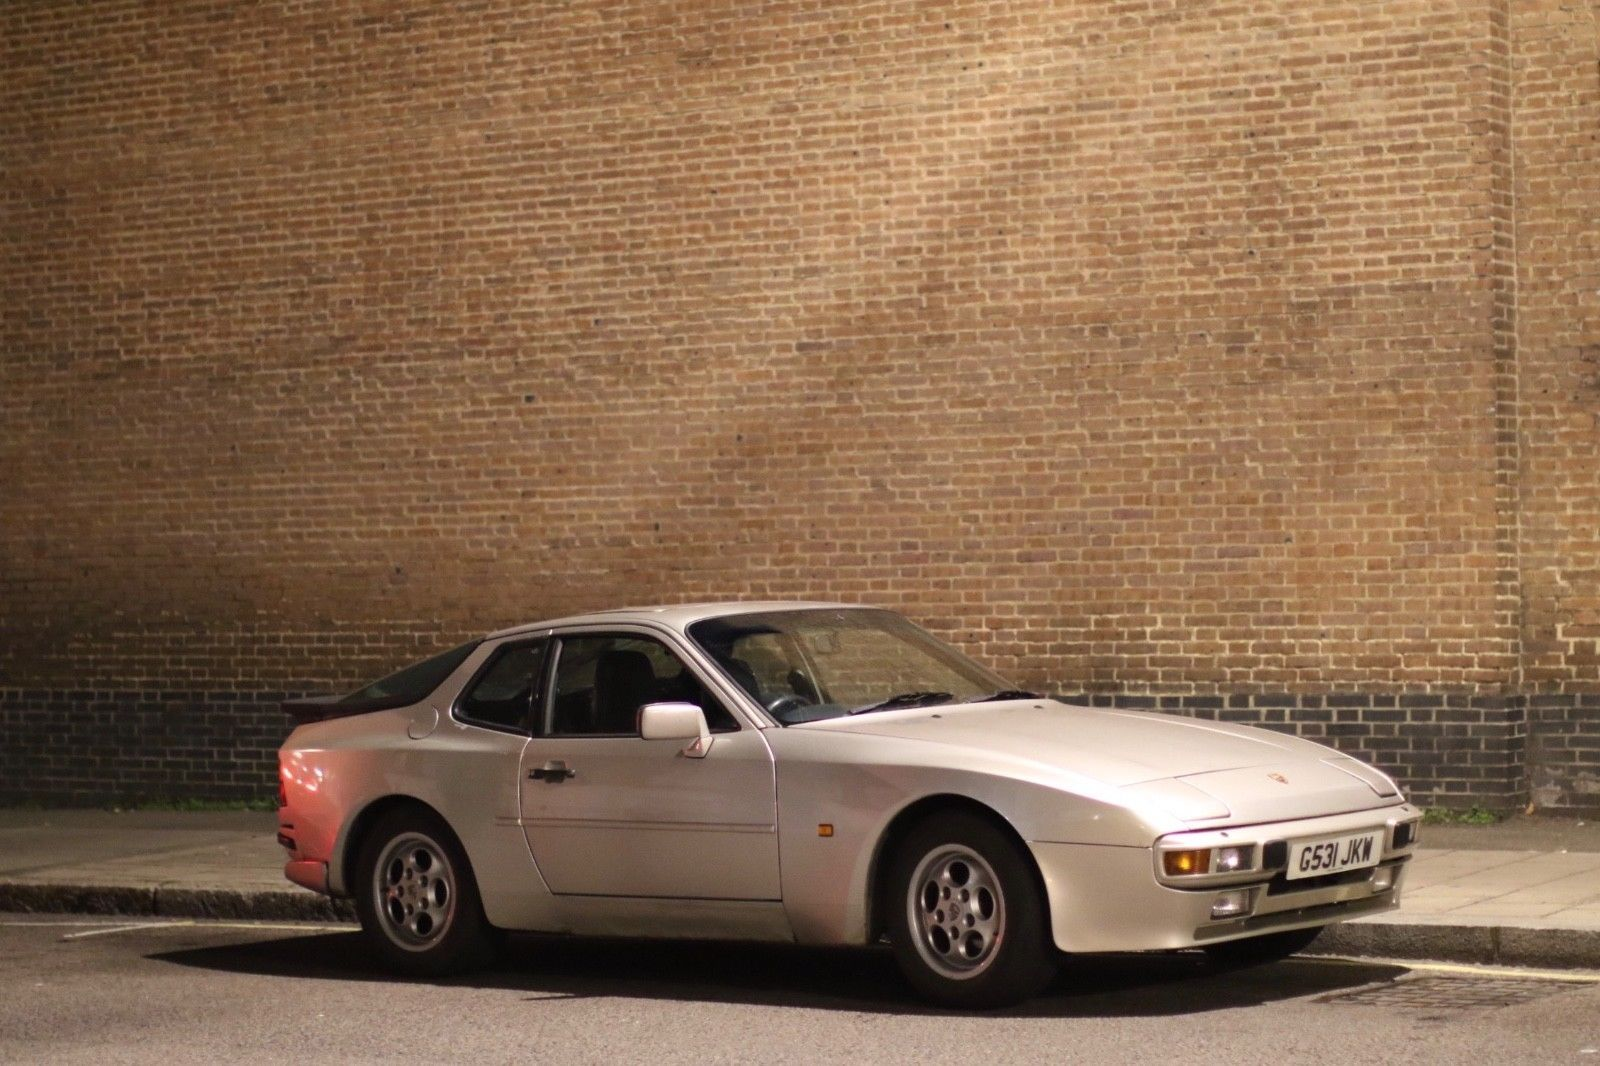 #Porscheclubsuk Porsche 944 2.7 LUX https://t.co/YFTI8rXx1Z https://t.co/Ze5JrYSYQR